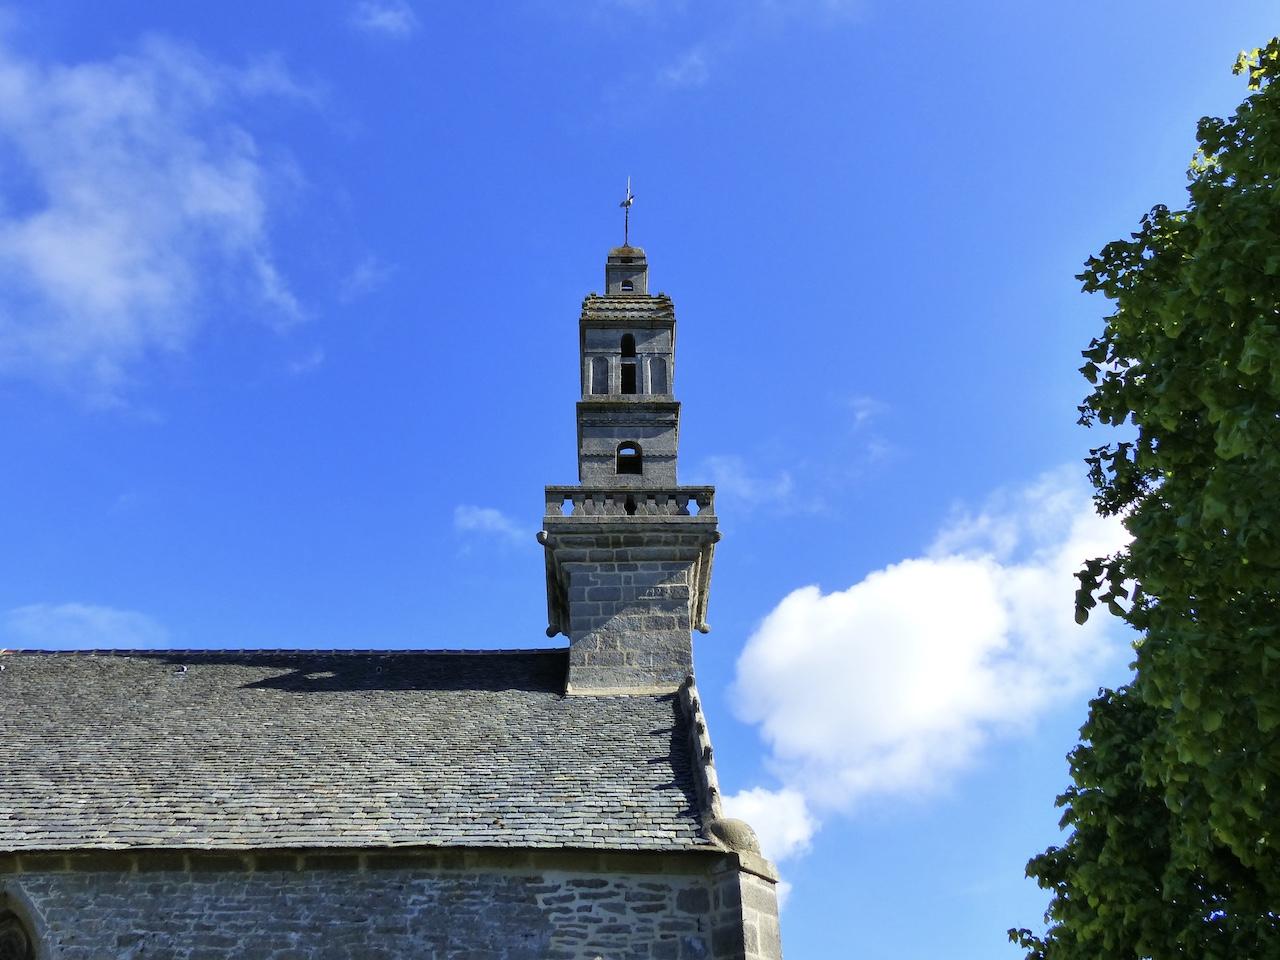 Chapelle de Kersaint 19